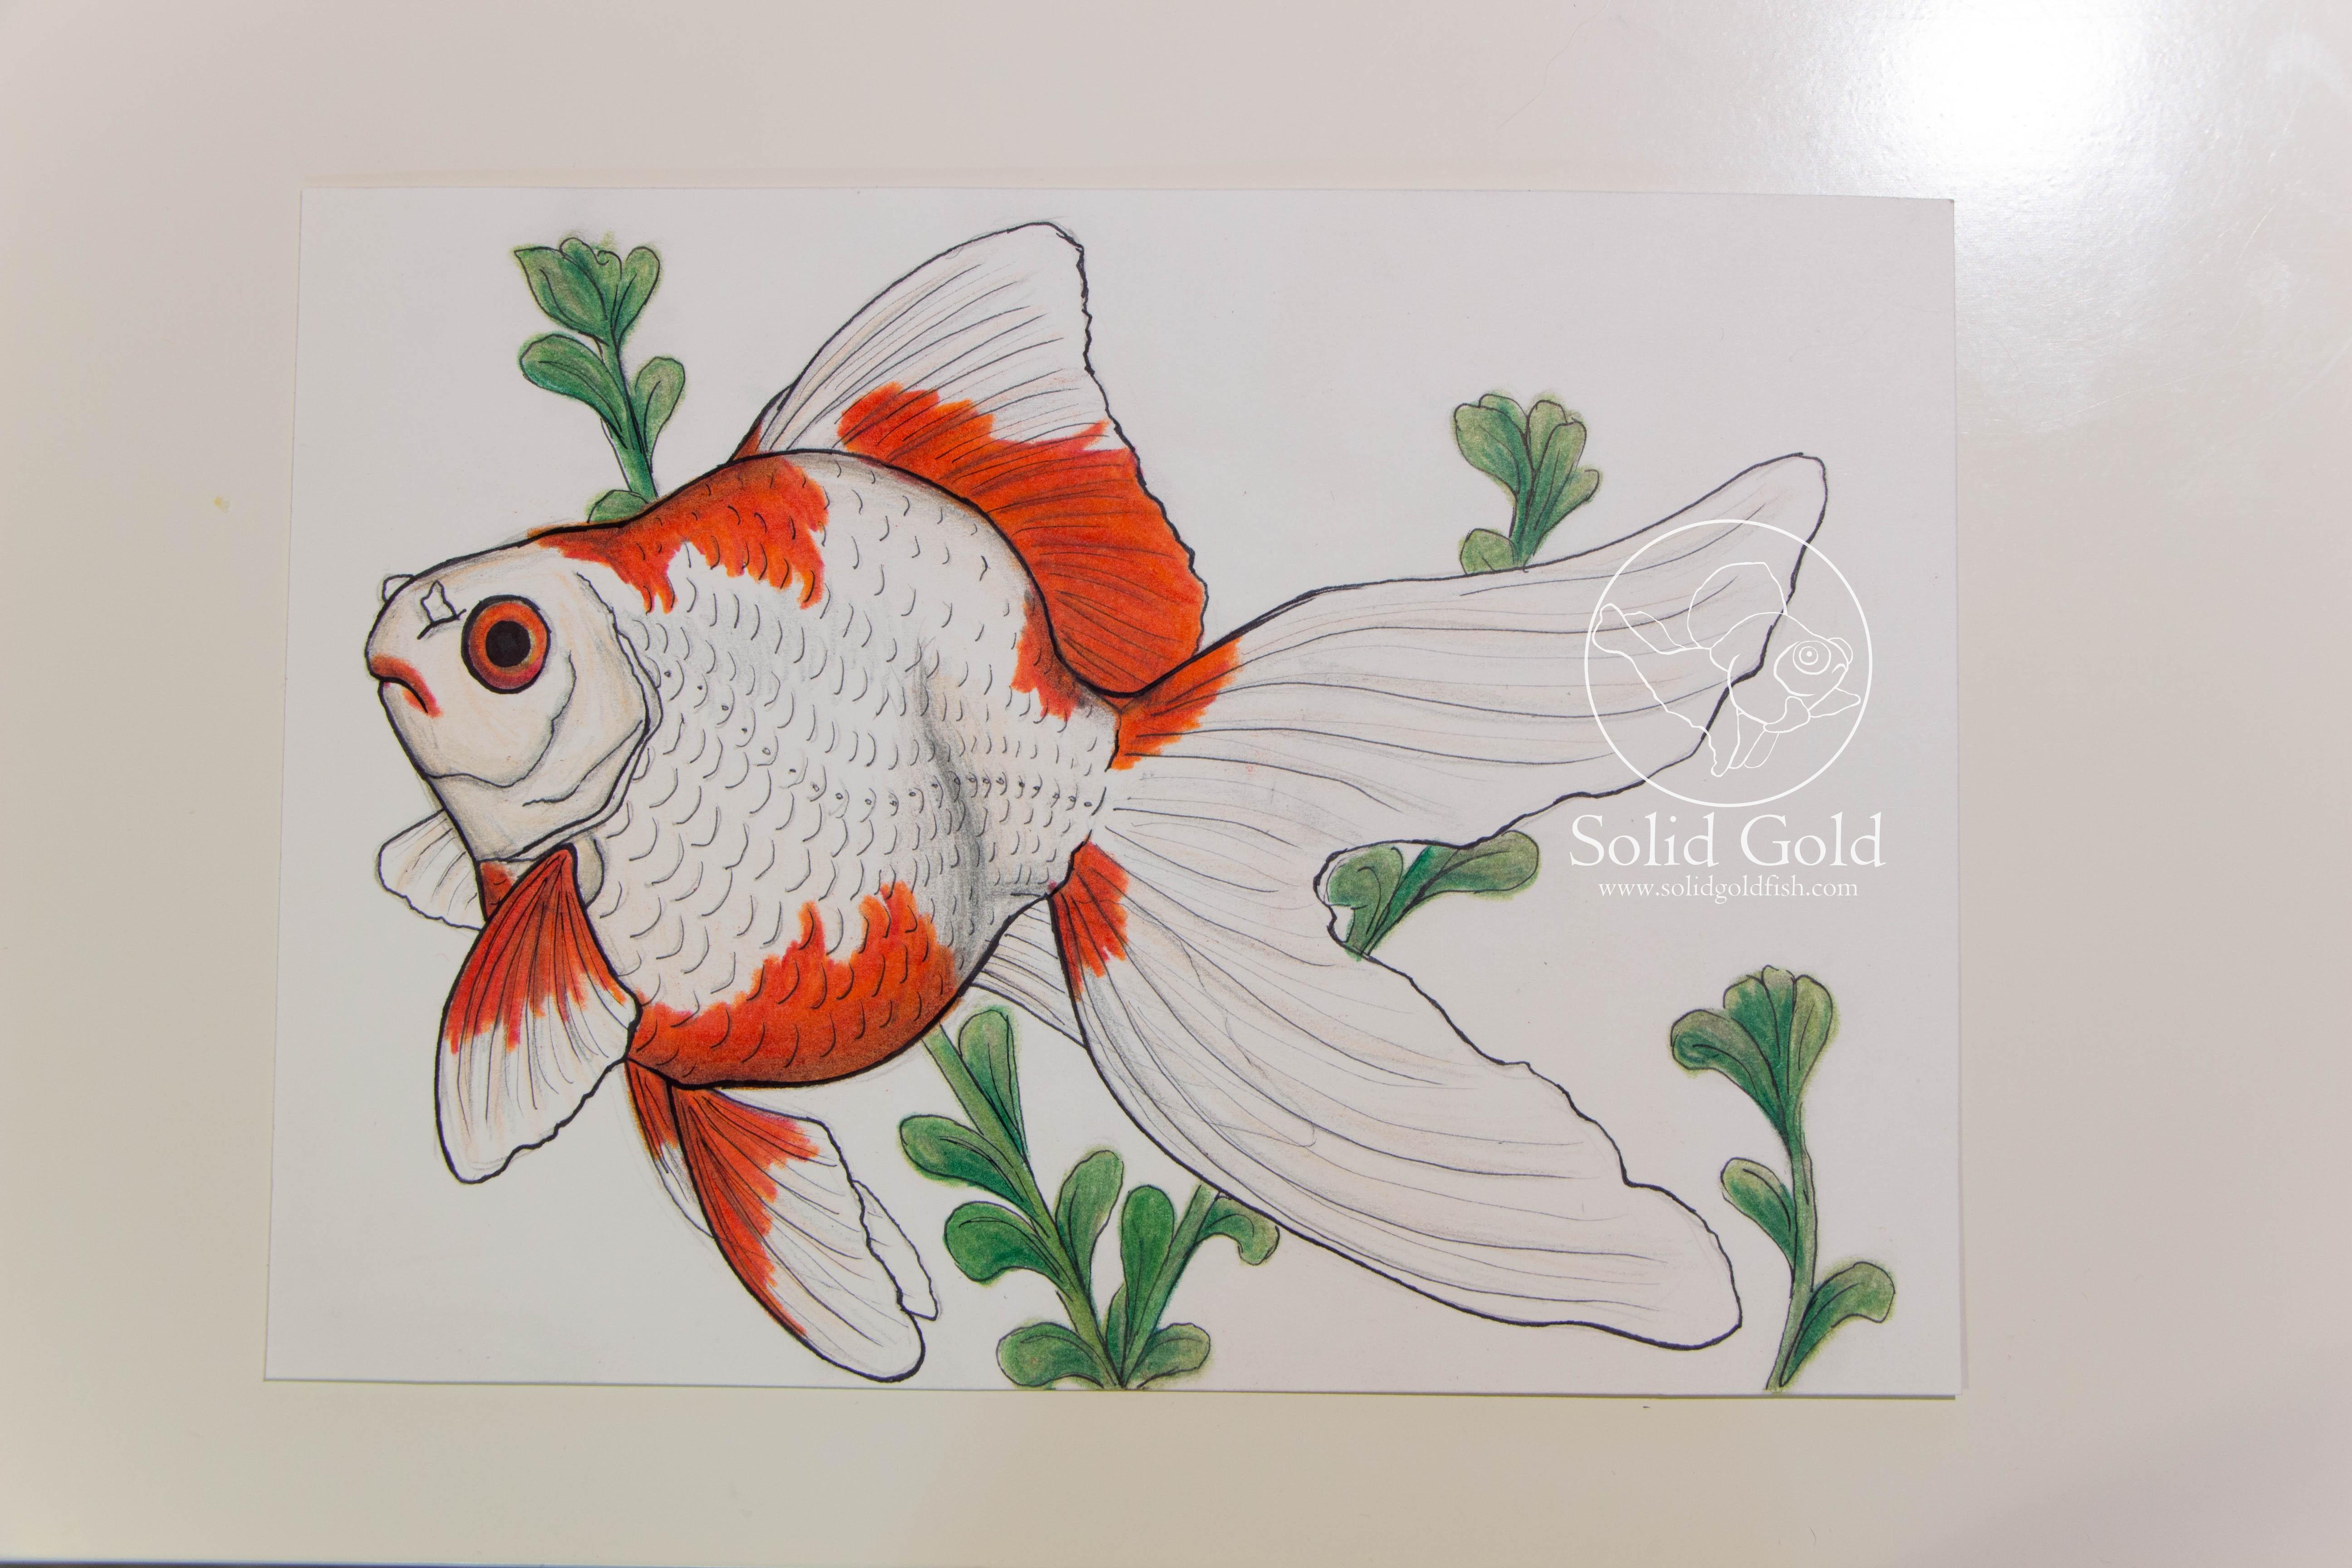 Drawn goldfish fancy goldfish Jennie drawing Tamasaba by Connelly